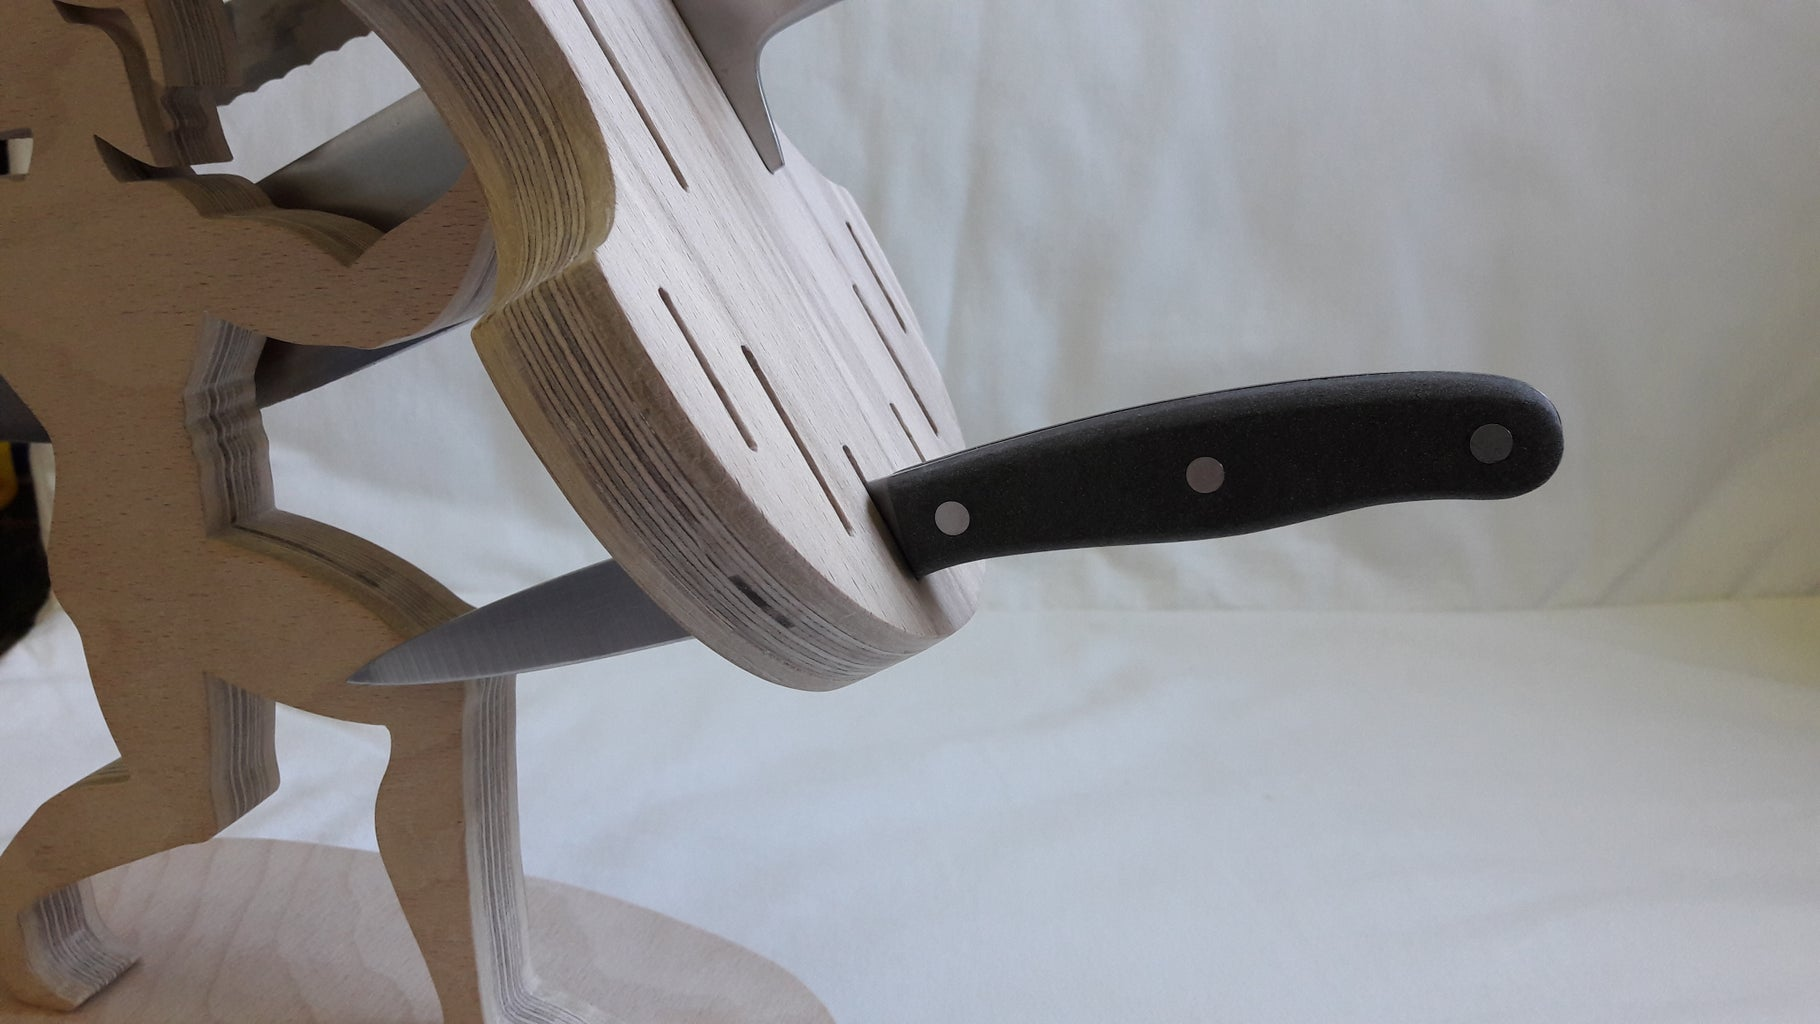 Adjustments for Your Knifes